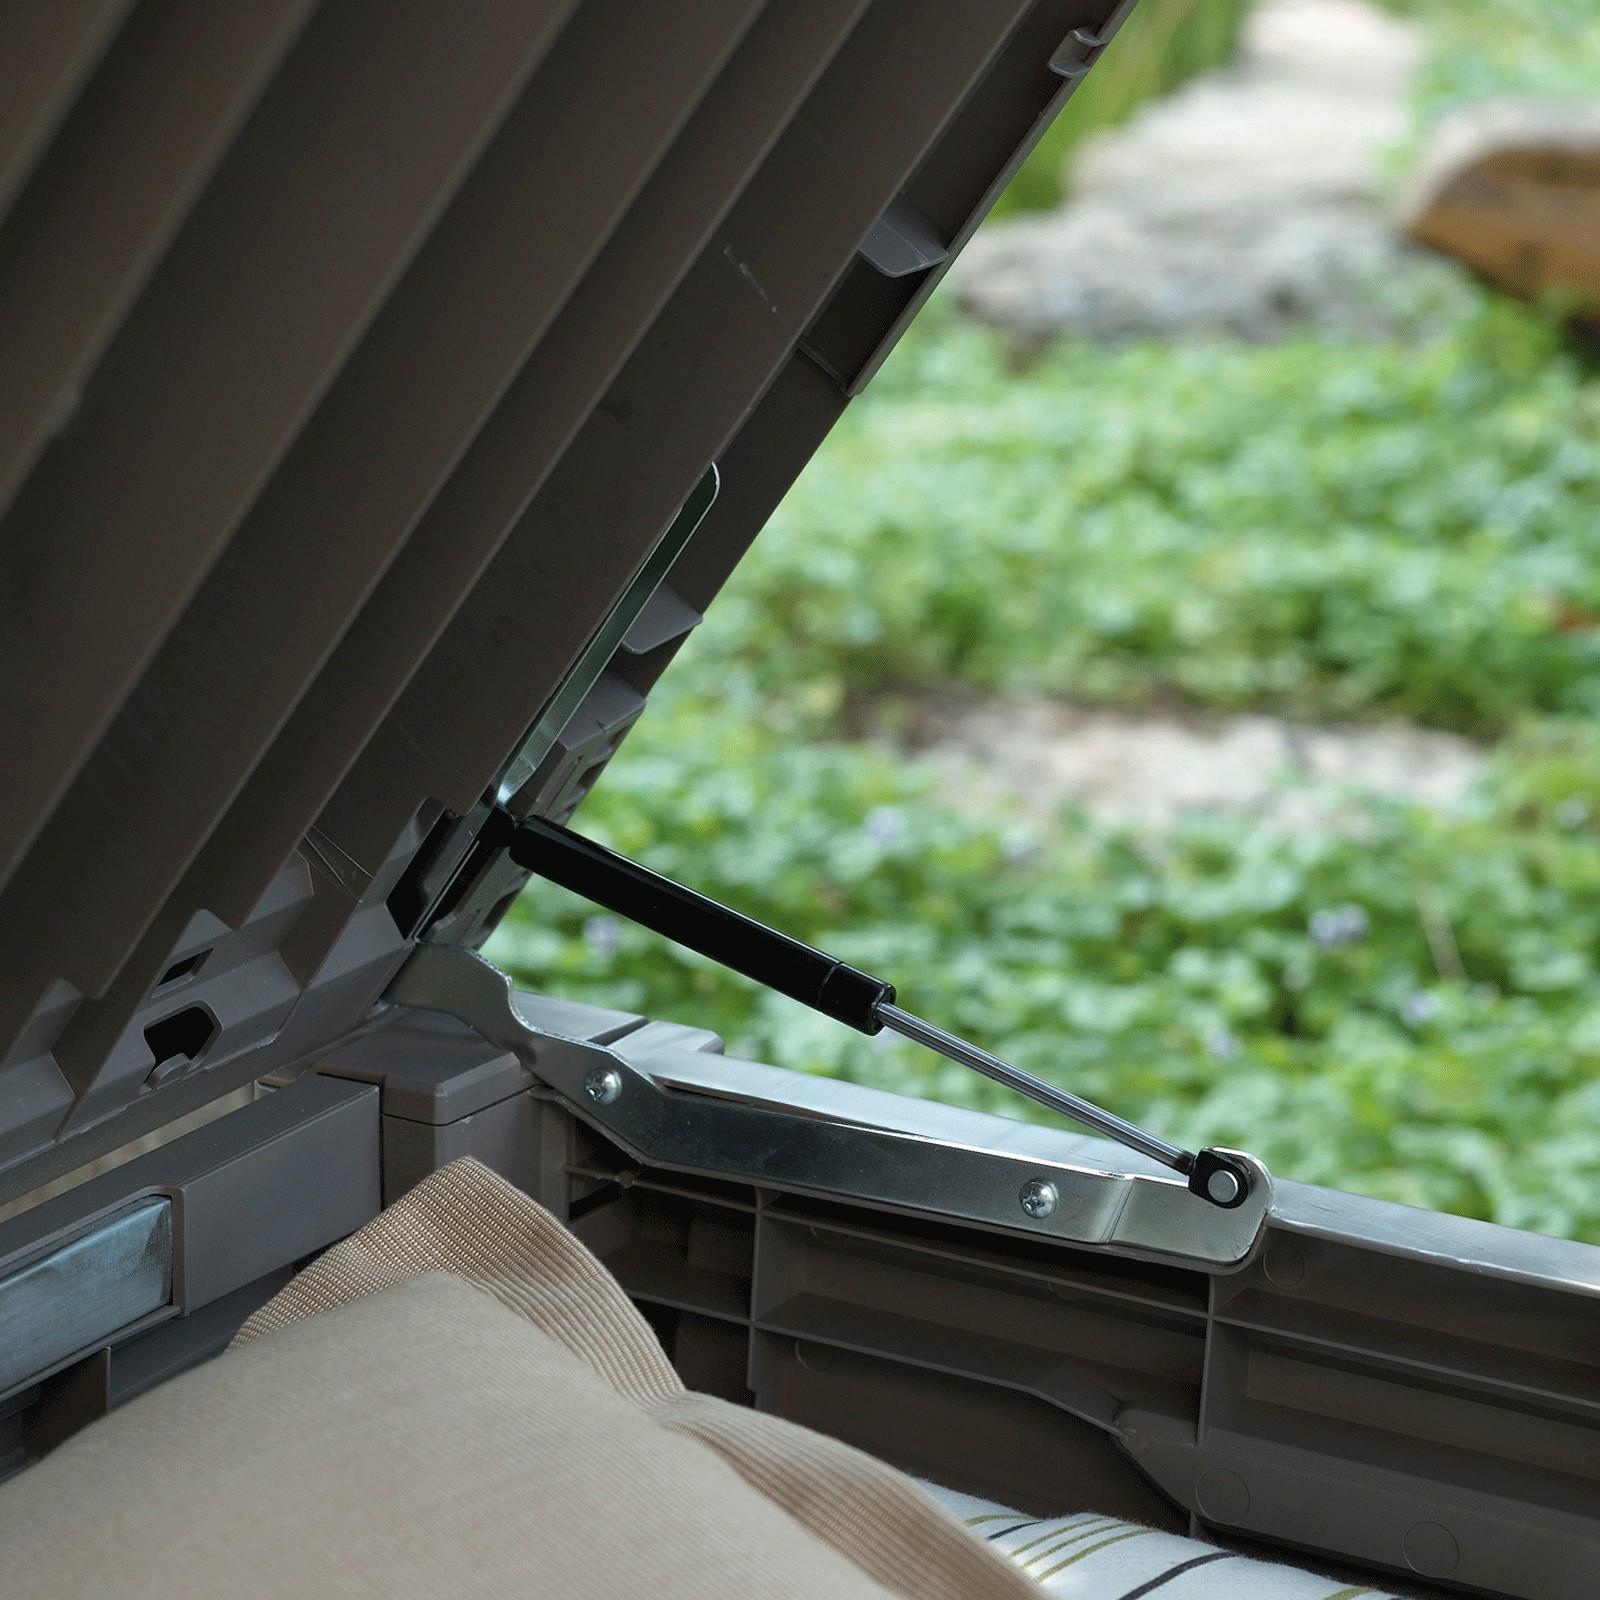 keter garten box aufbewahrungsbox kissenbox auflagenbox brightwood 455 l truhe. Black Bedroom Furniture Sets. Home Design Ideas